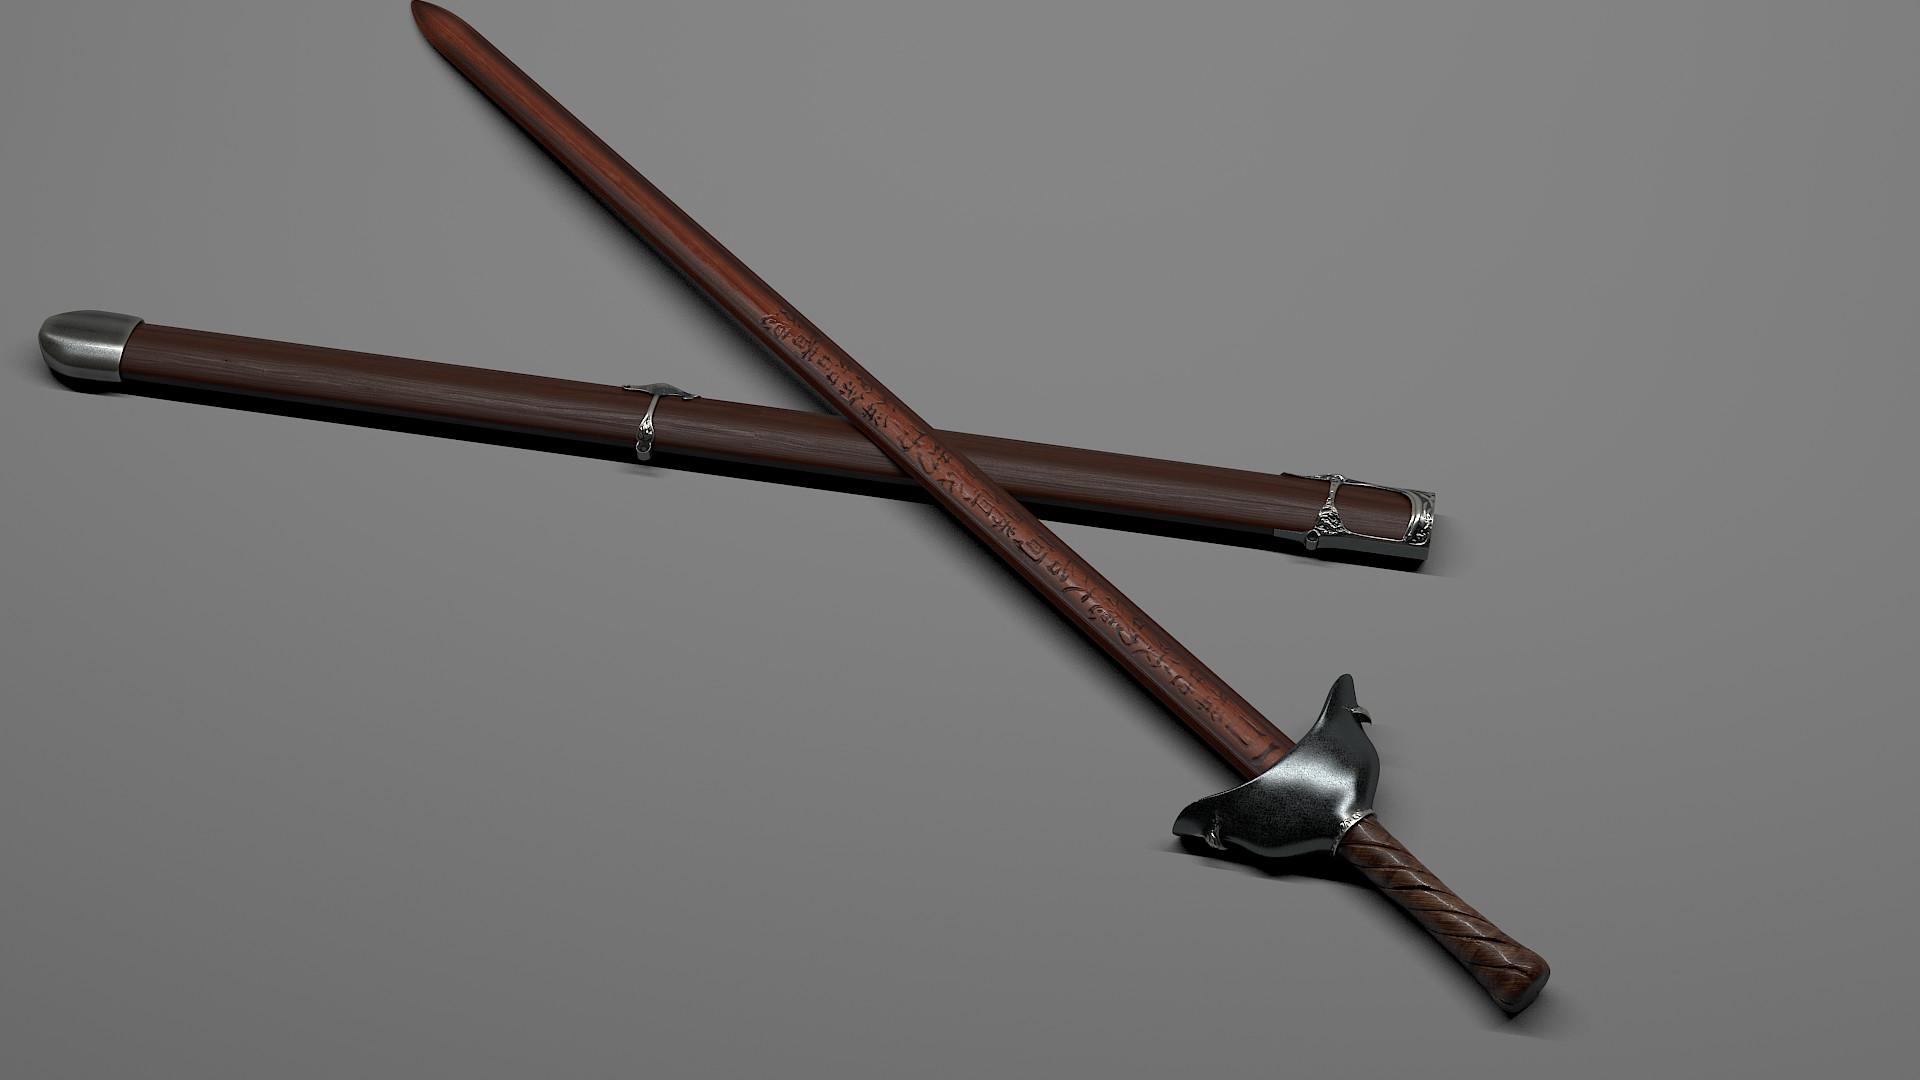 Kai liu peach wood sword